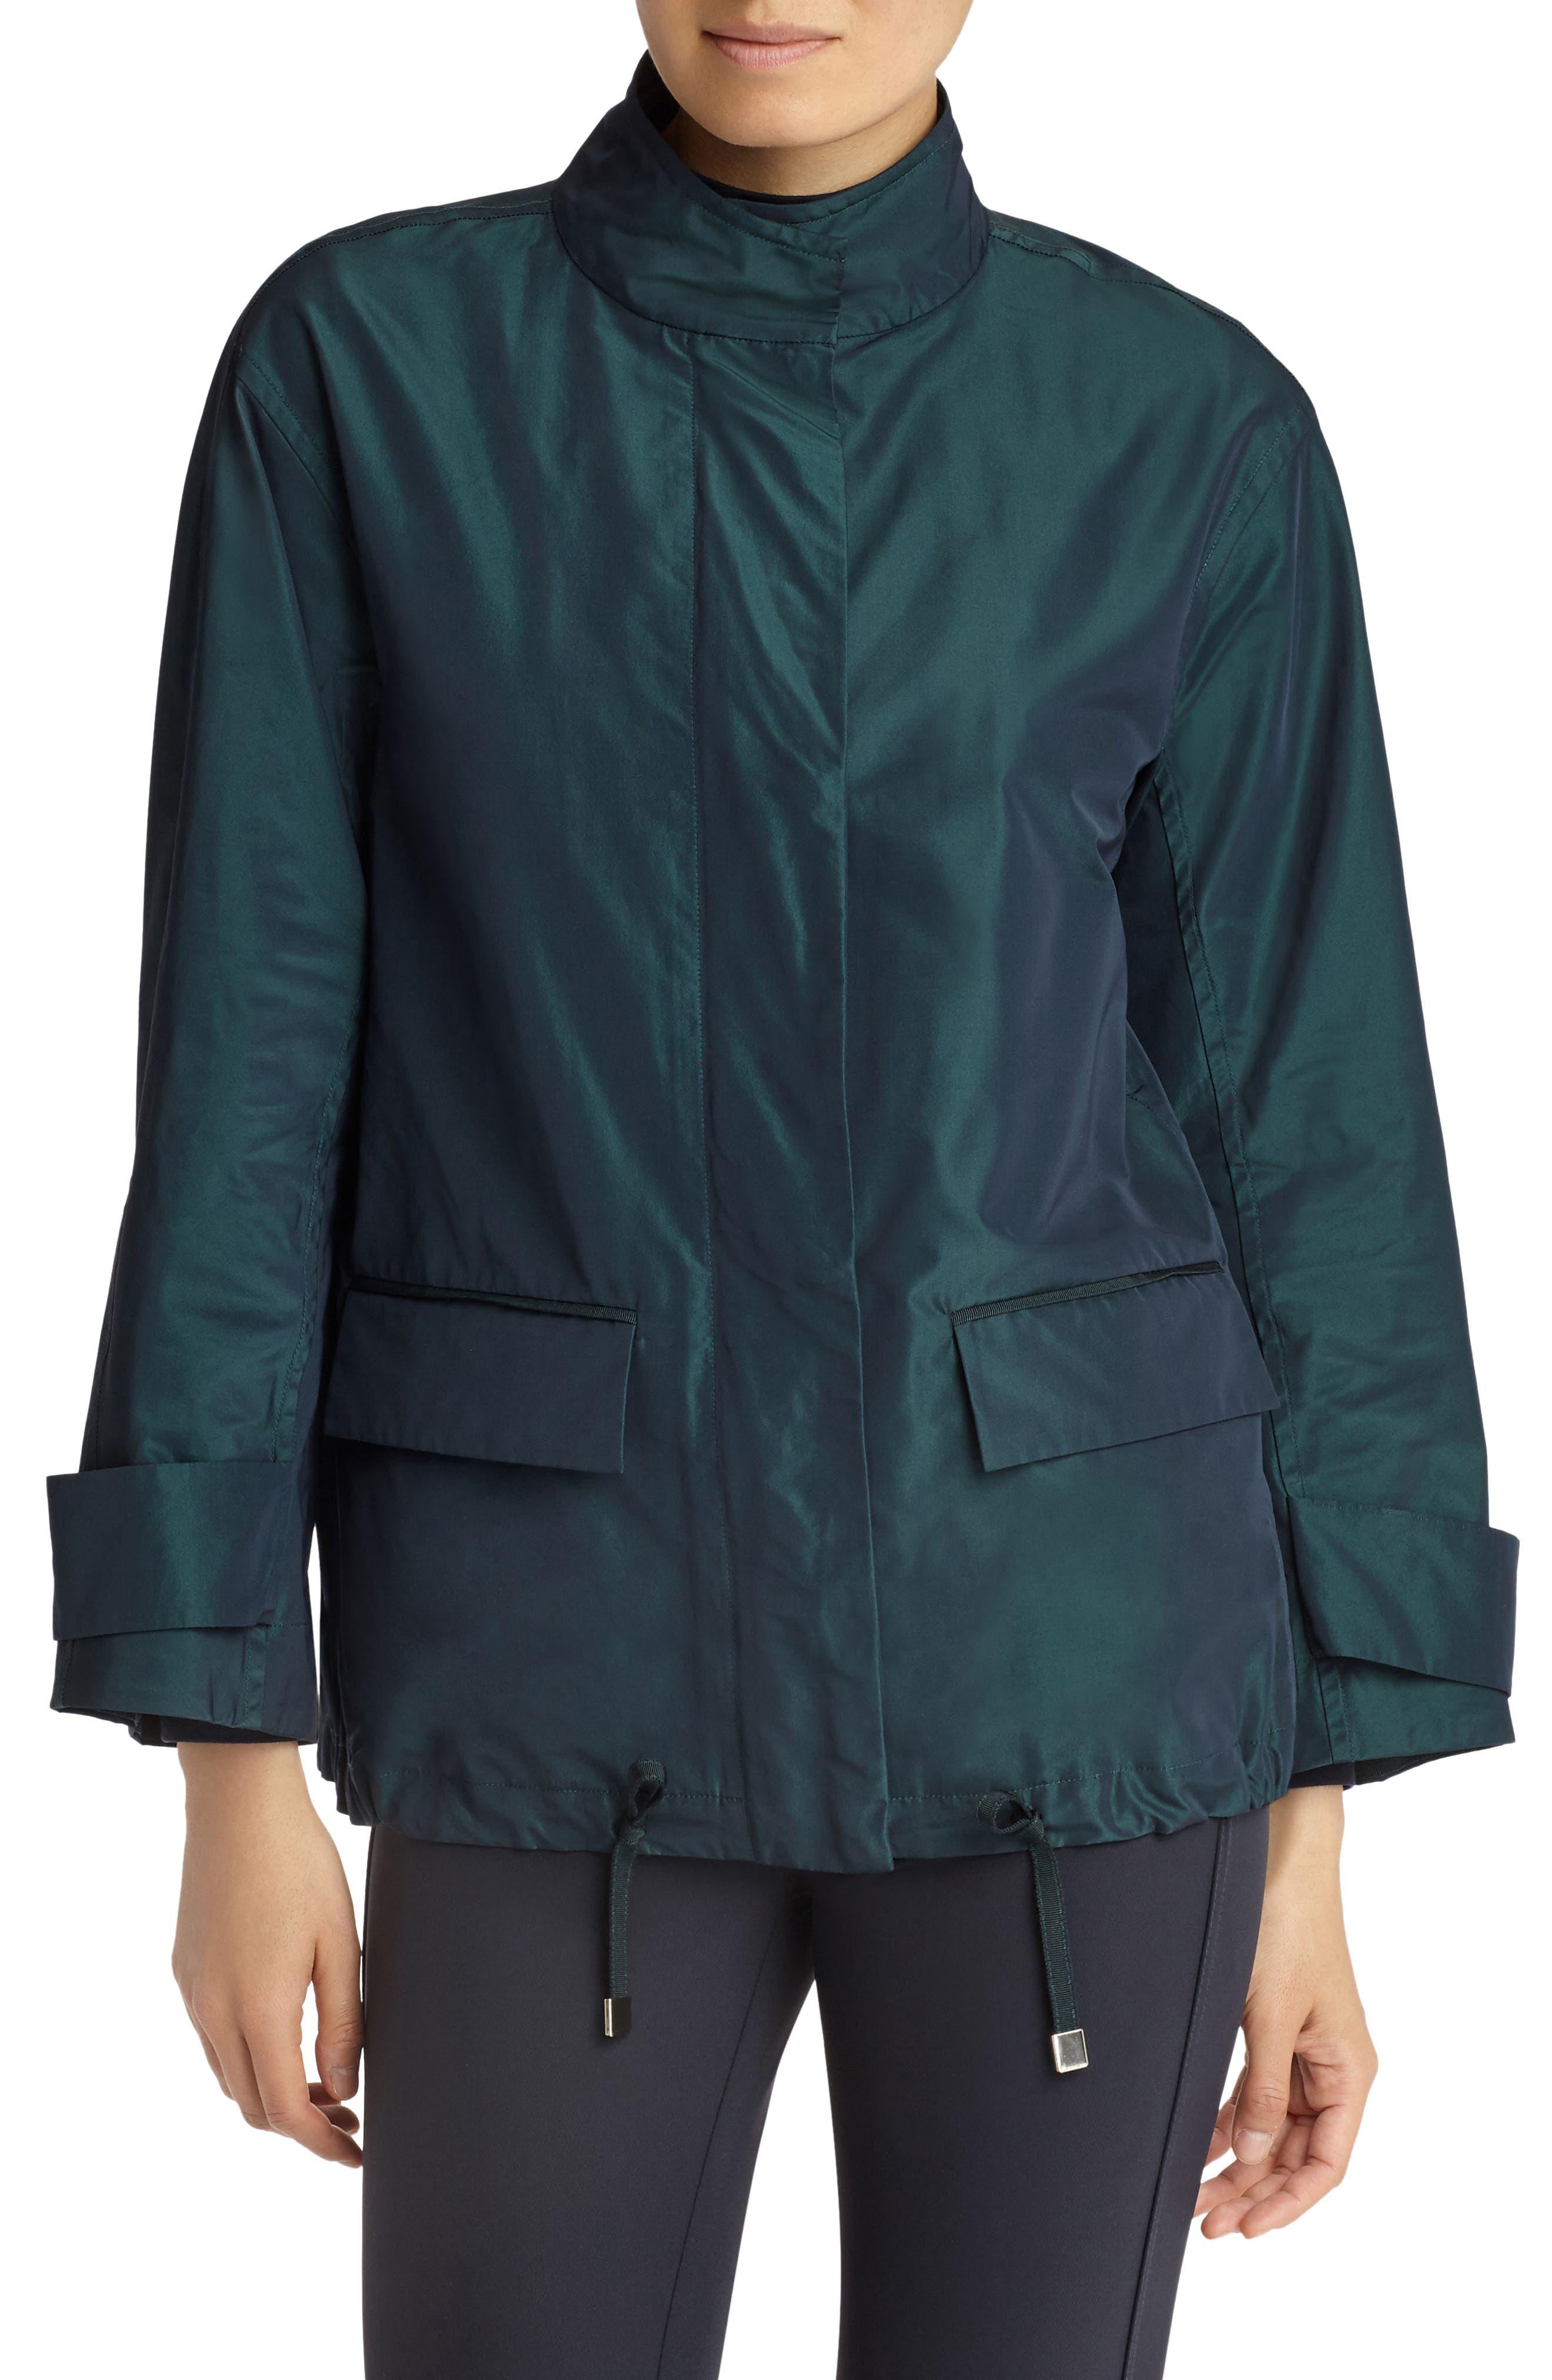 Markus Empirical Tech Cloth Jacket,                         Main,                         color,